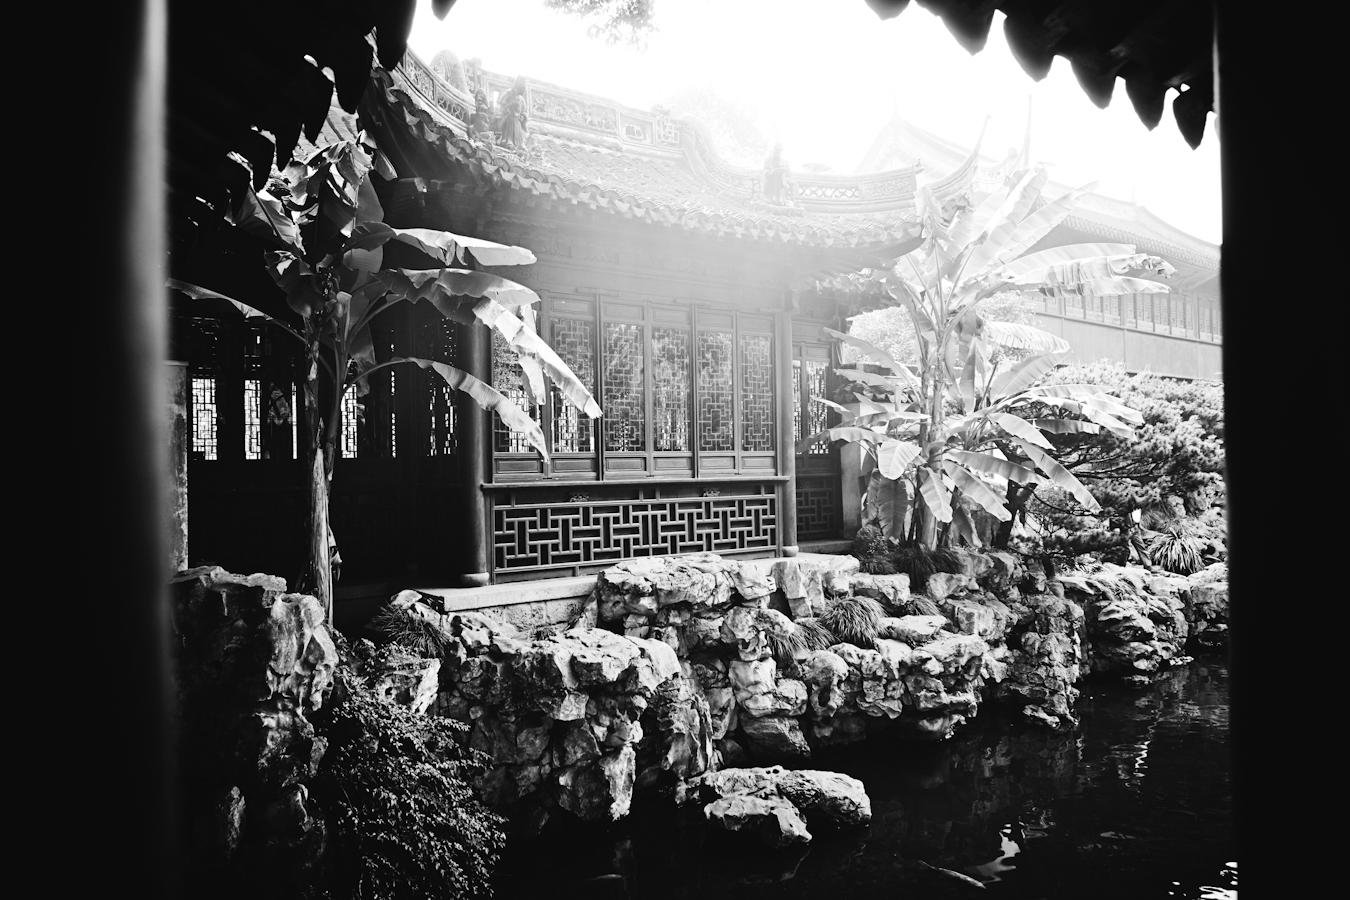 yuyuan_be_hupfer-006.jpg